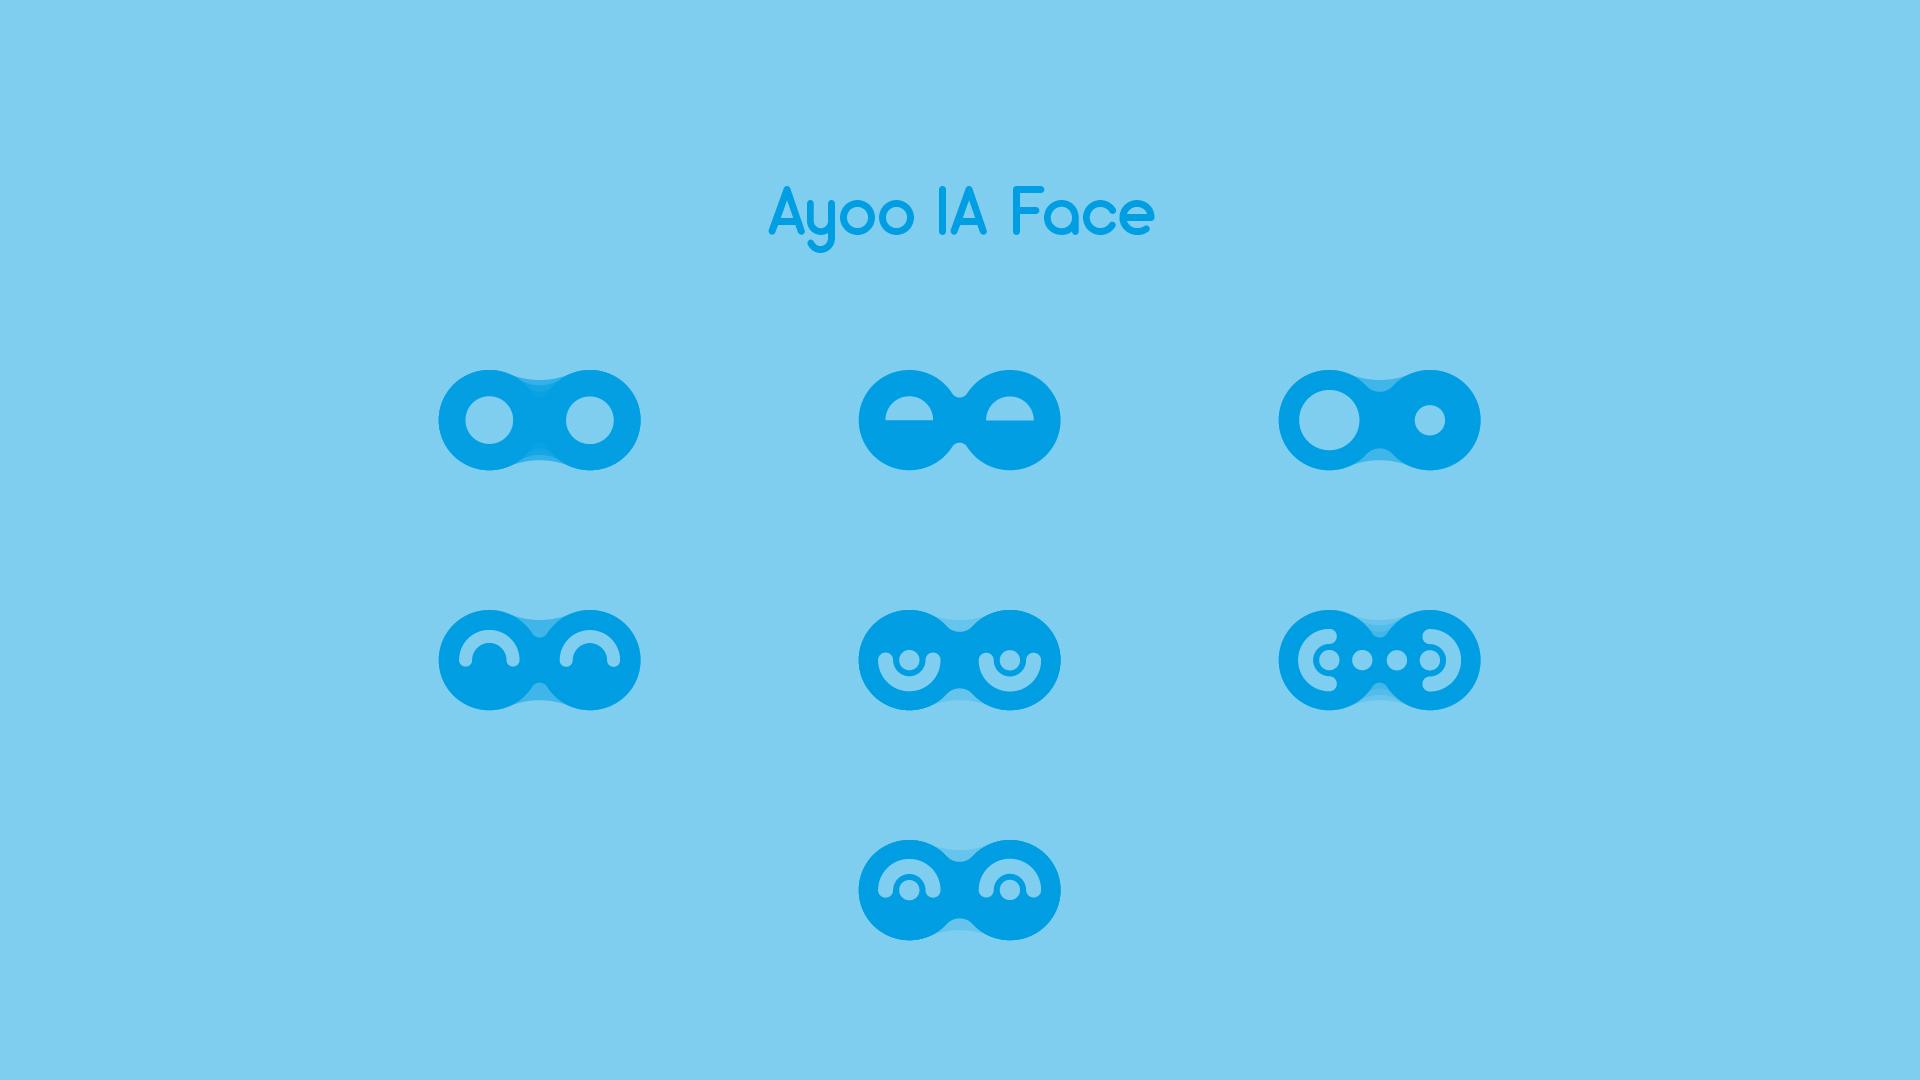 Ayoo_IA_Faces_light